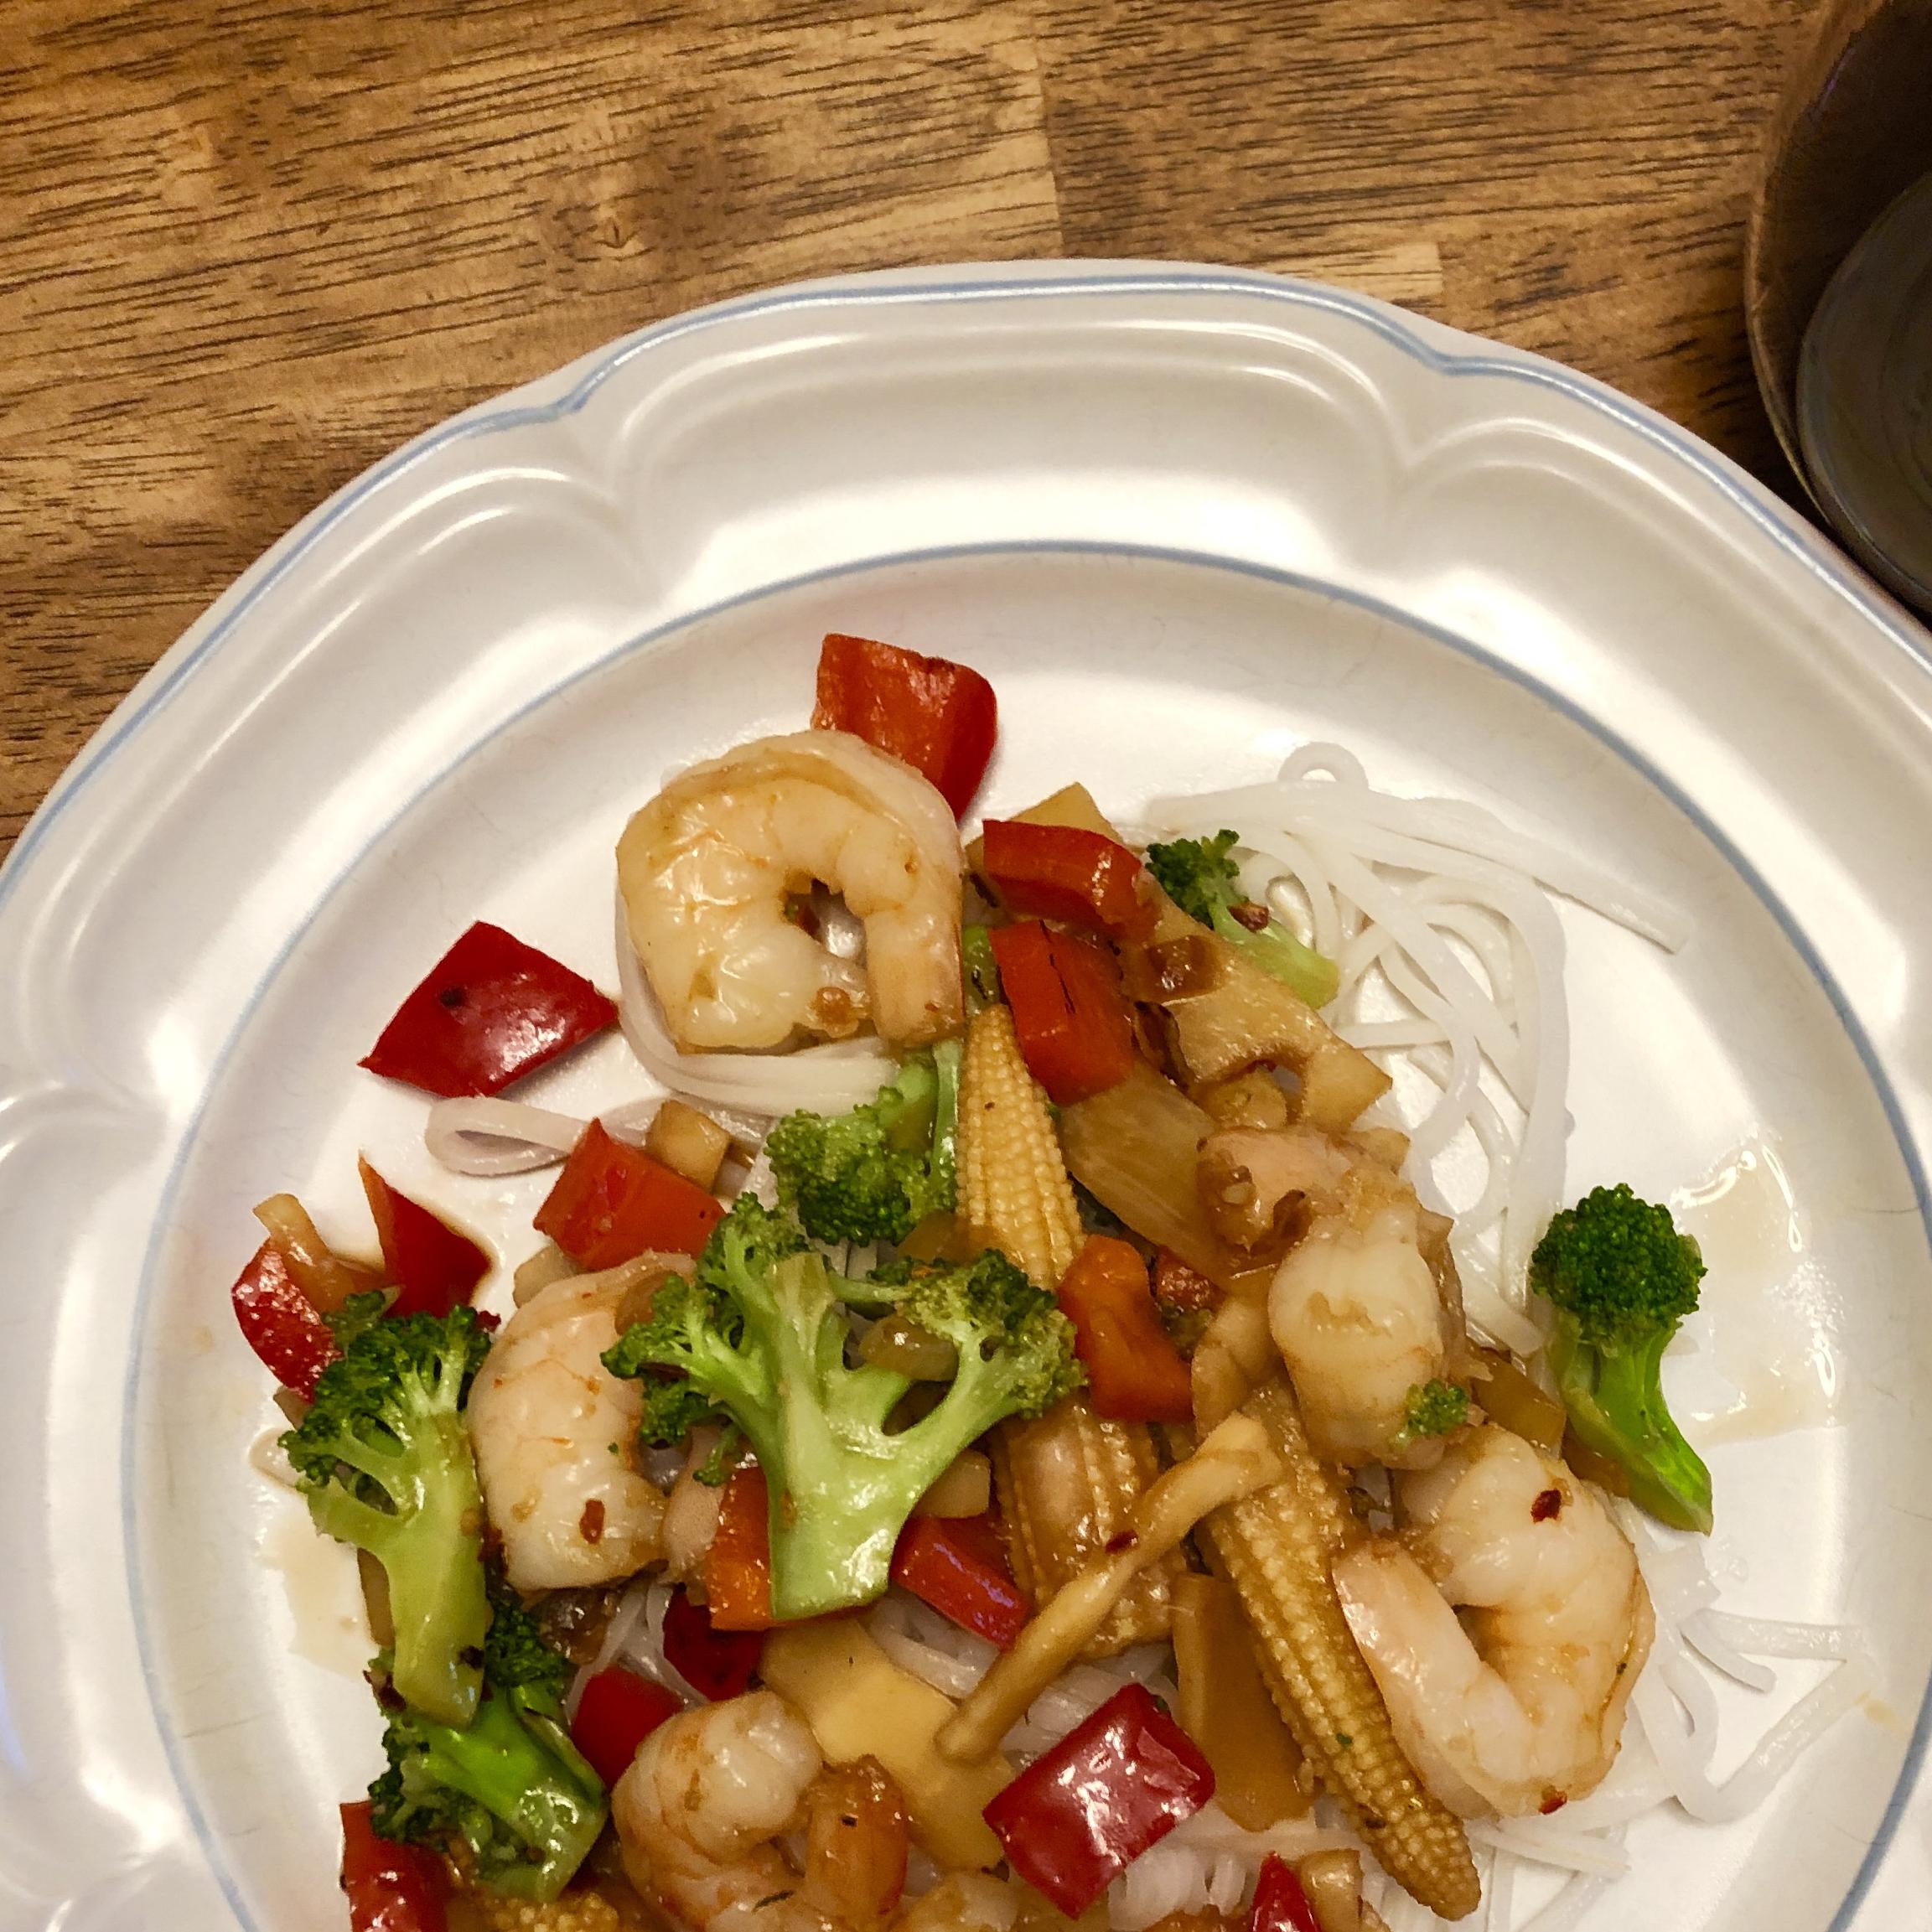 Shrimp Stir Fry With Egg Noodles artsie ace